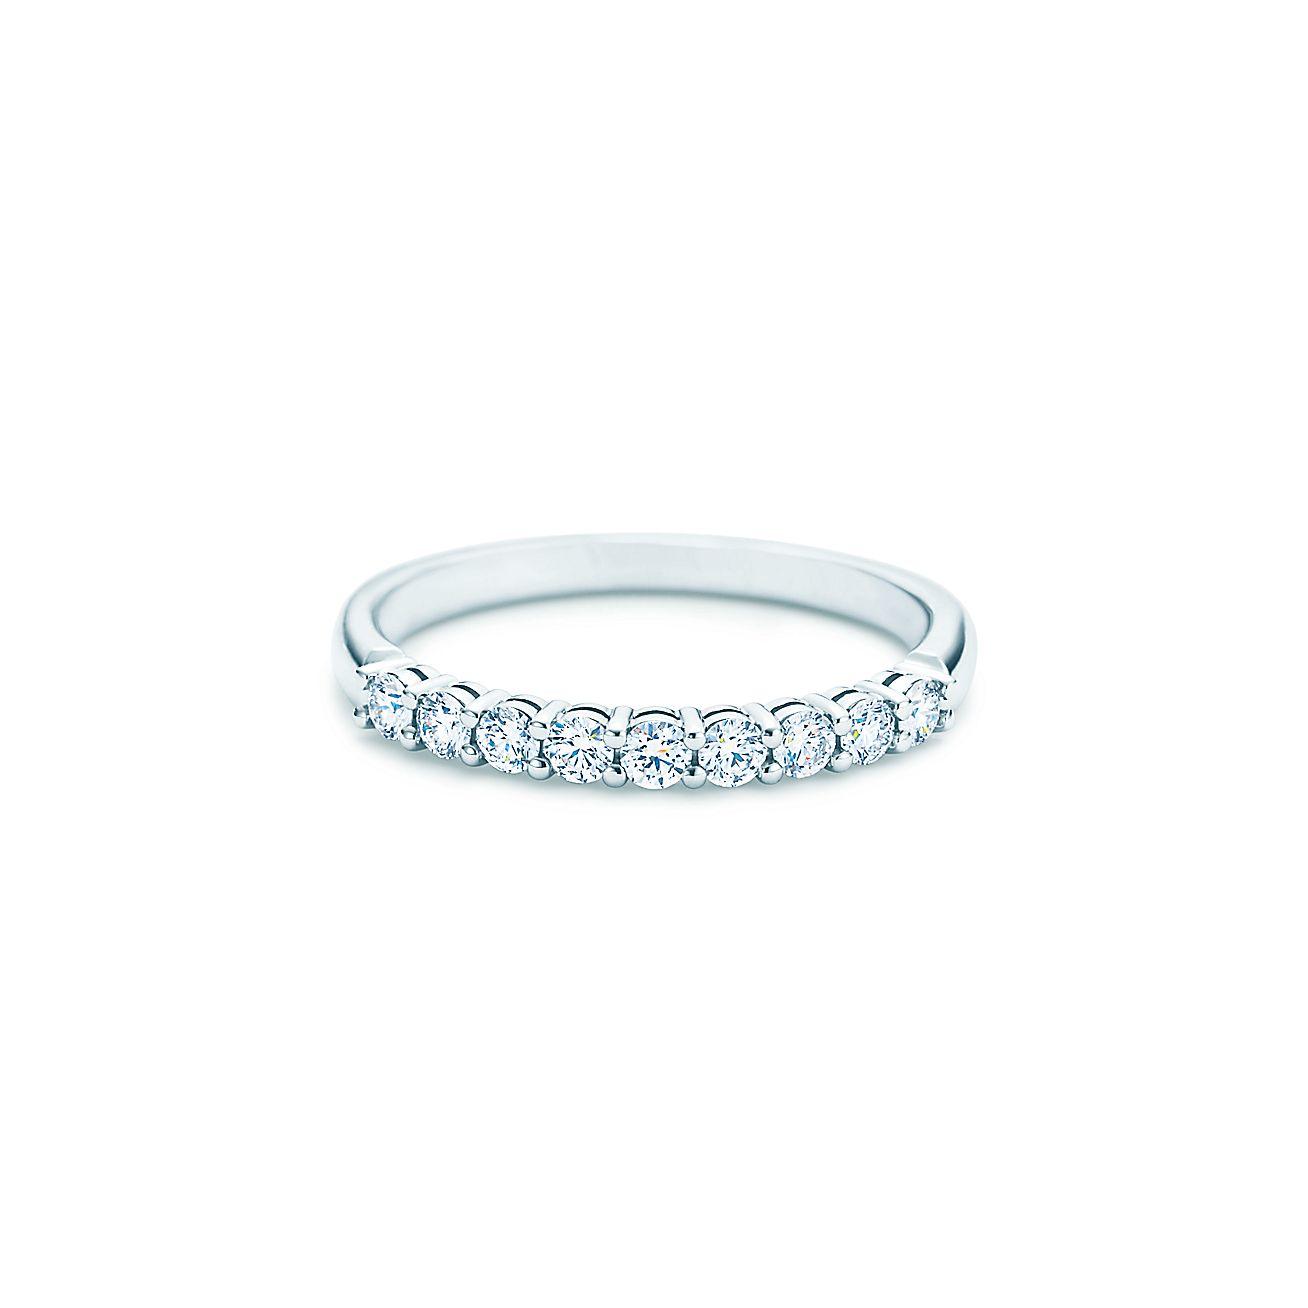 Small Tiffany Gold Rings